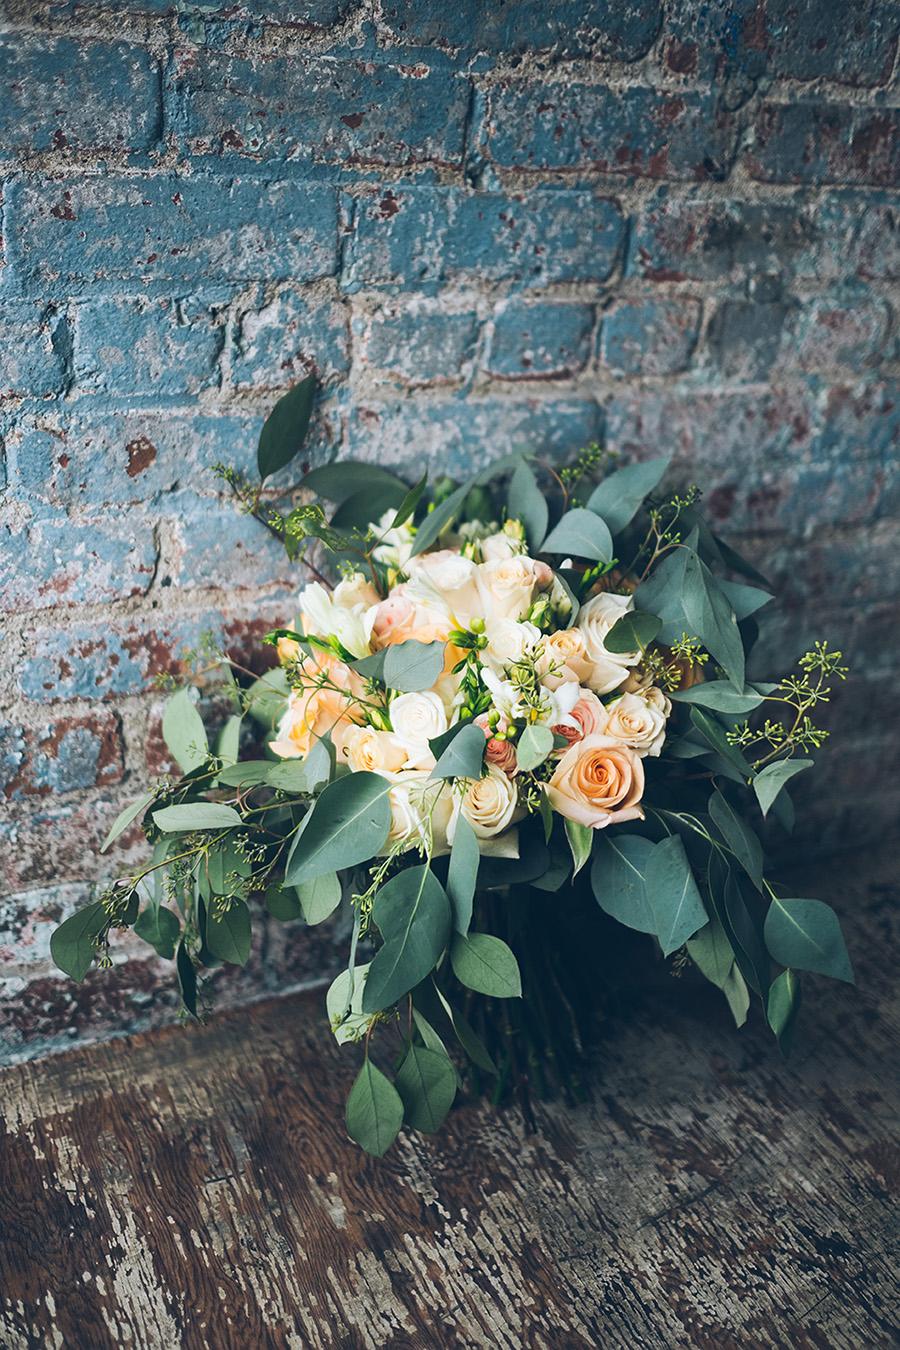 LIN-JOEY-NYC-WEDDING-METROPOLITANBUILDING-DETAILS-CYNTHIACHUNG-0072.jpg